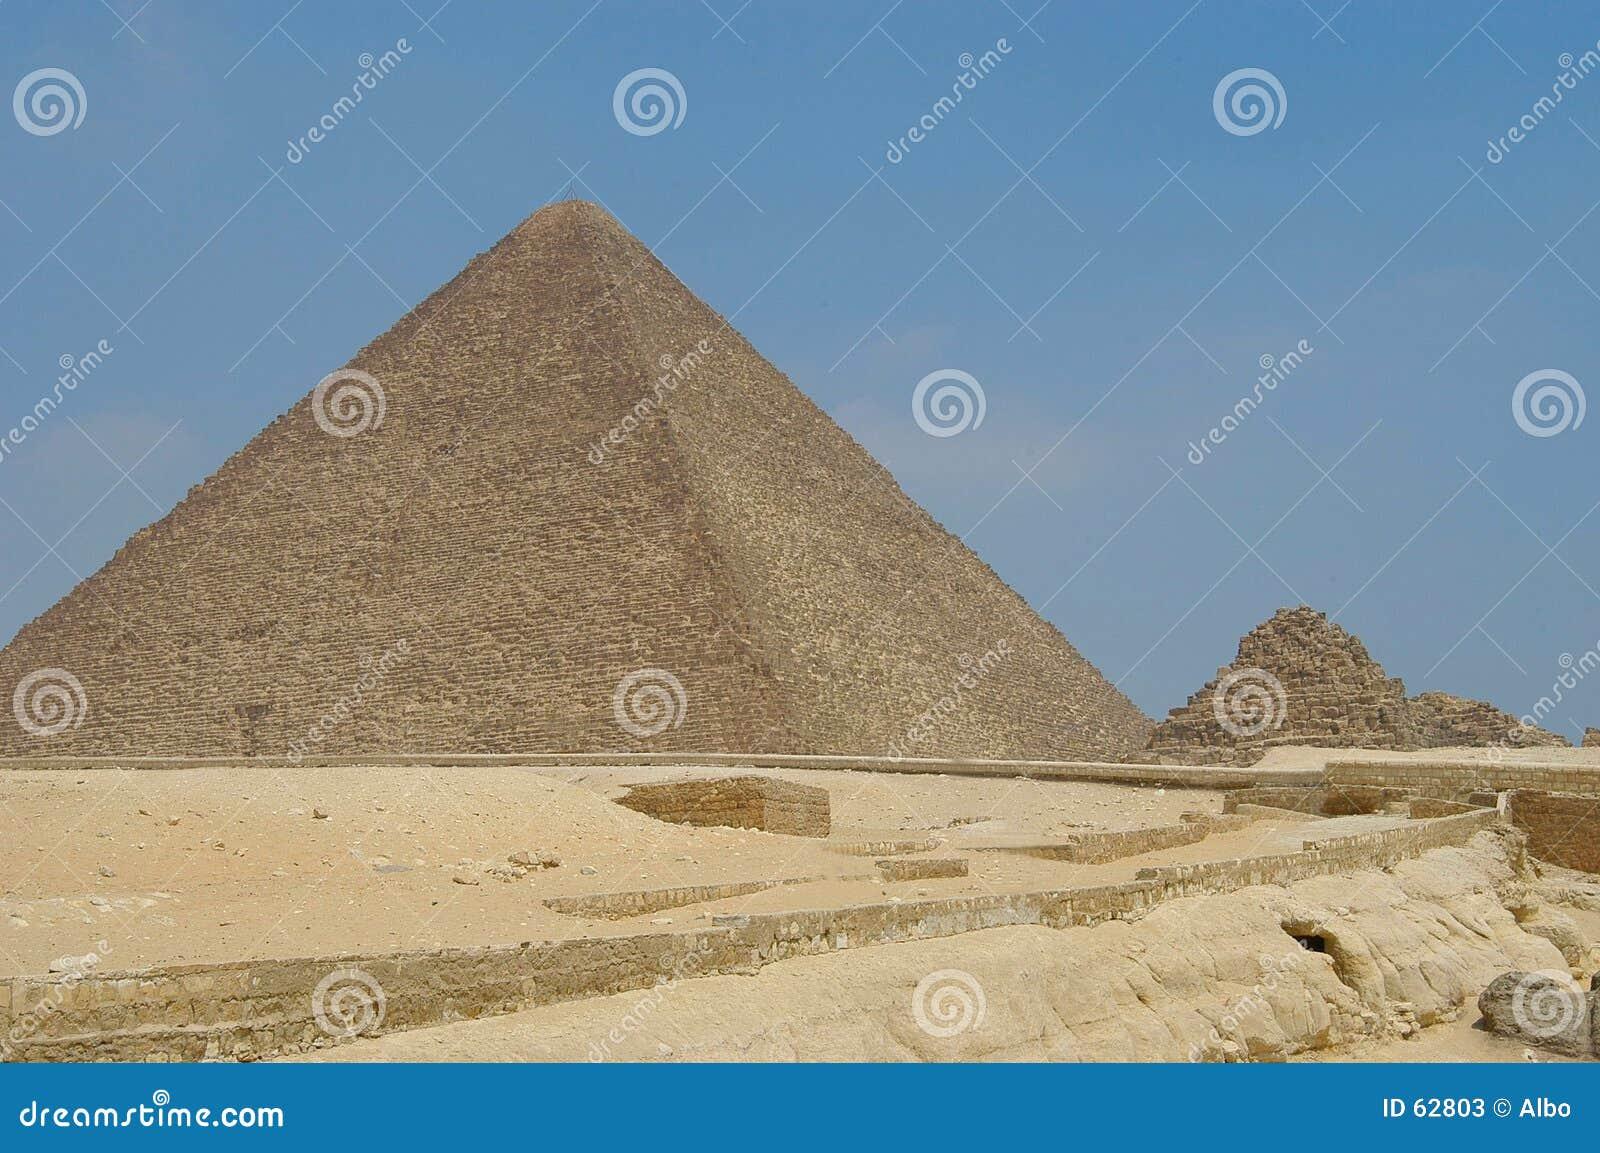 Download πυραμίδα micerino στοκ εικόνα. εικόνα από κύβος, χρυσός - 62803